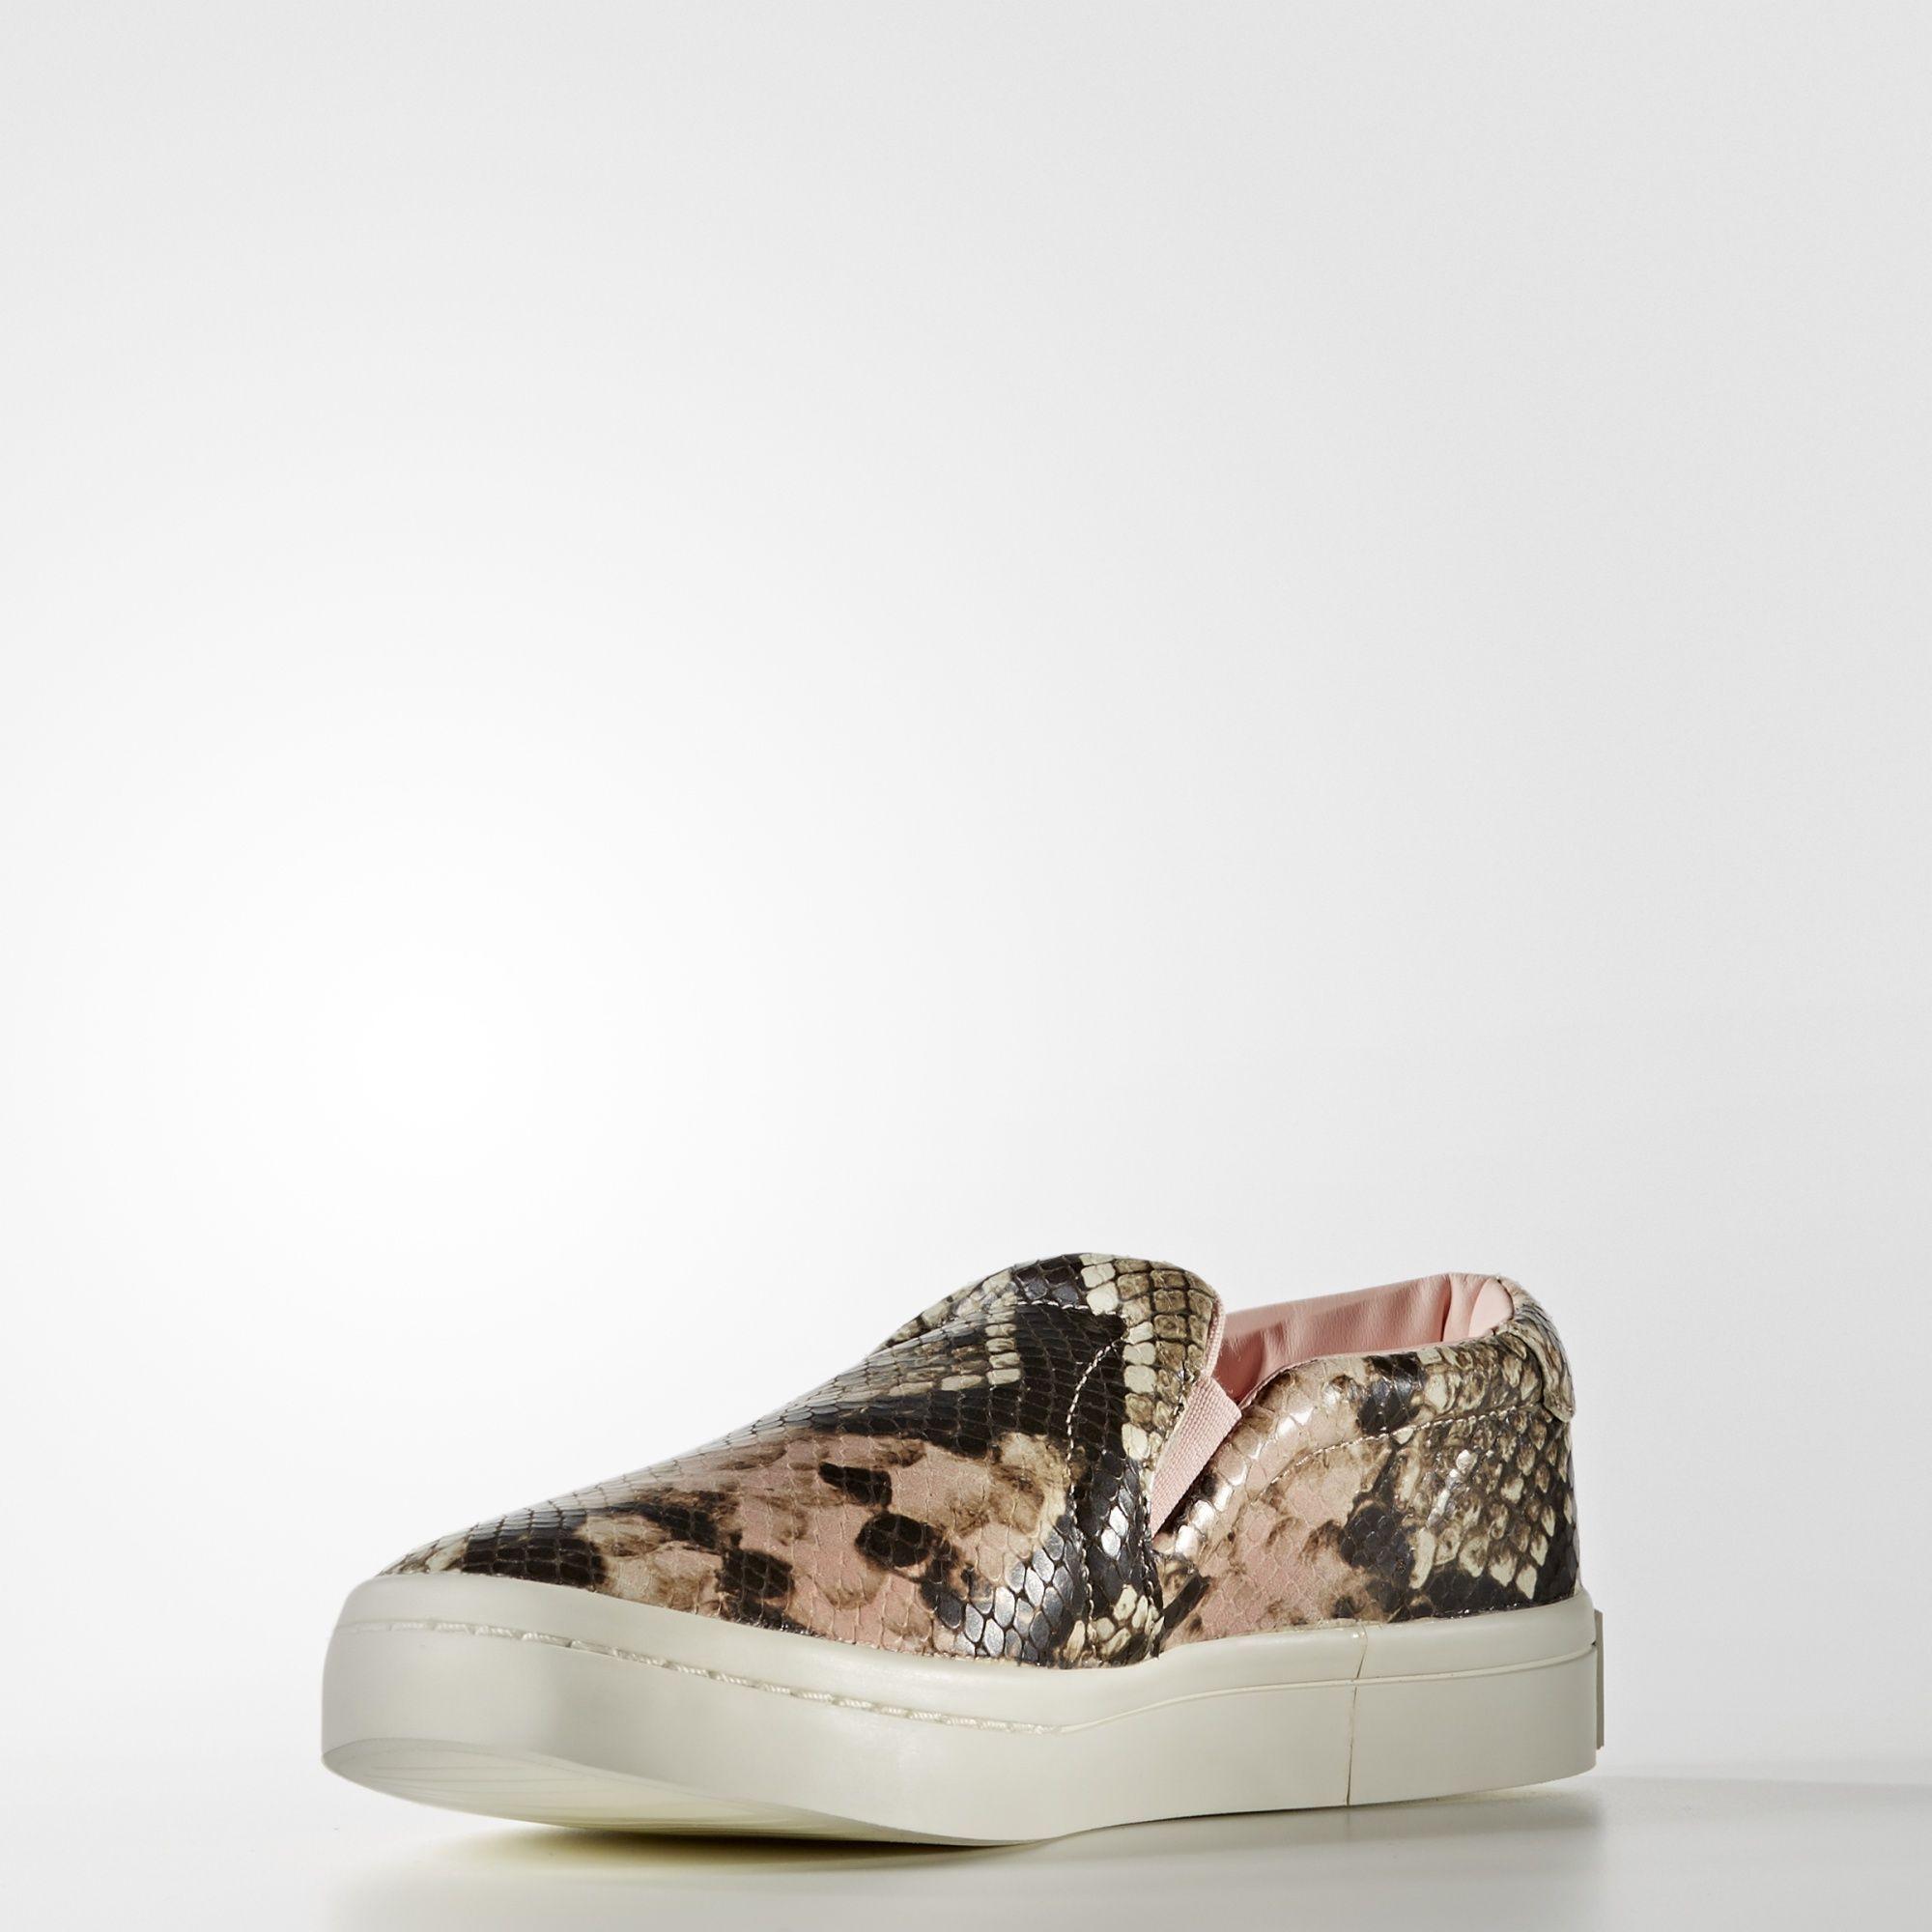 7c469be01d2 adidas - Court Vantage Slip-on Shoes